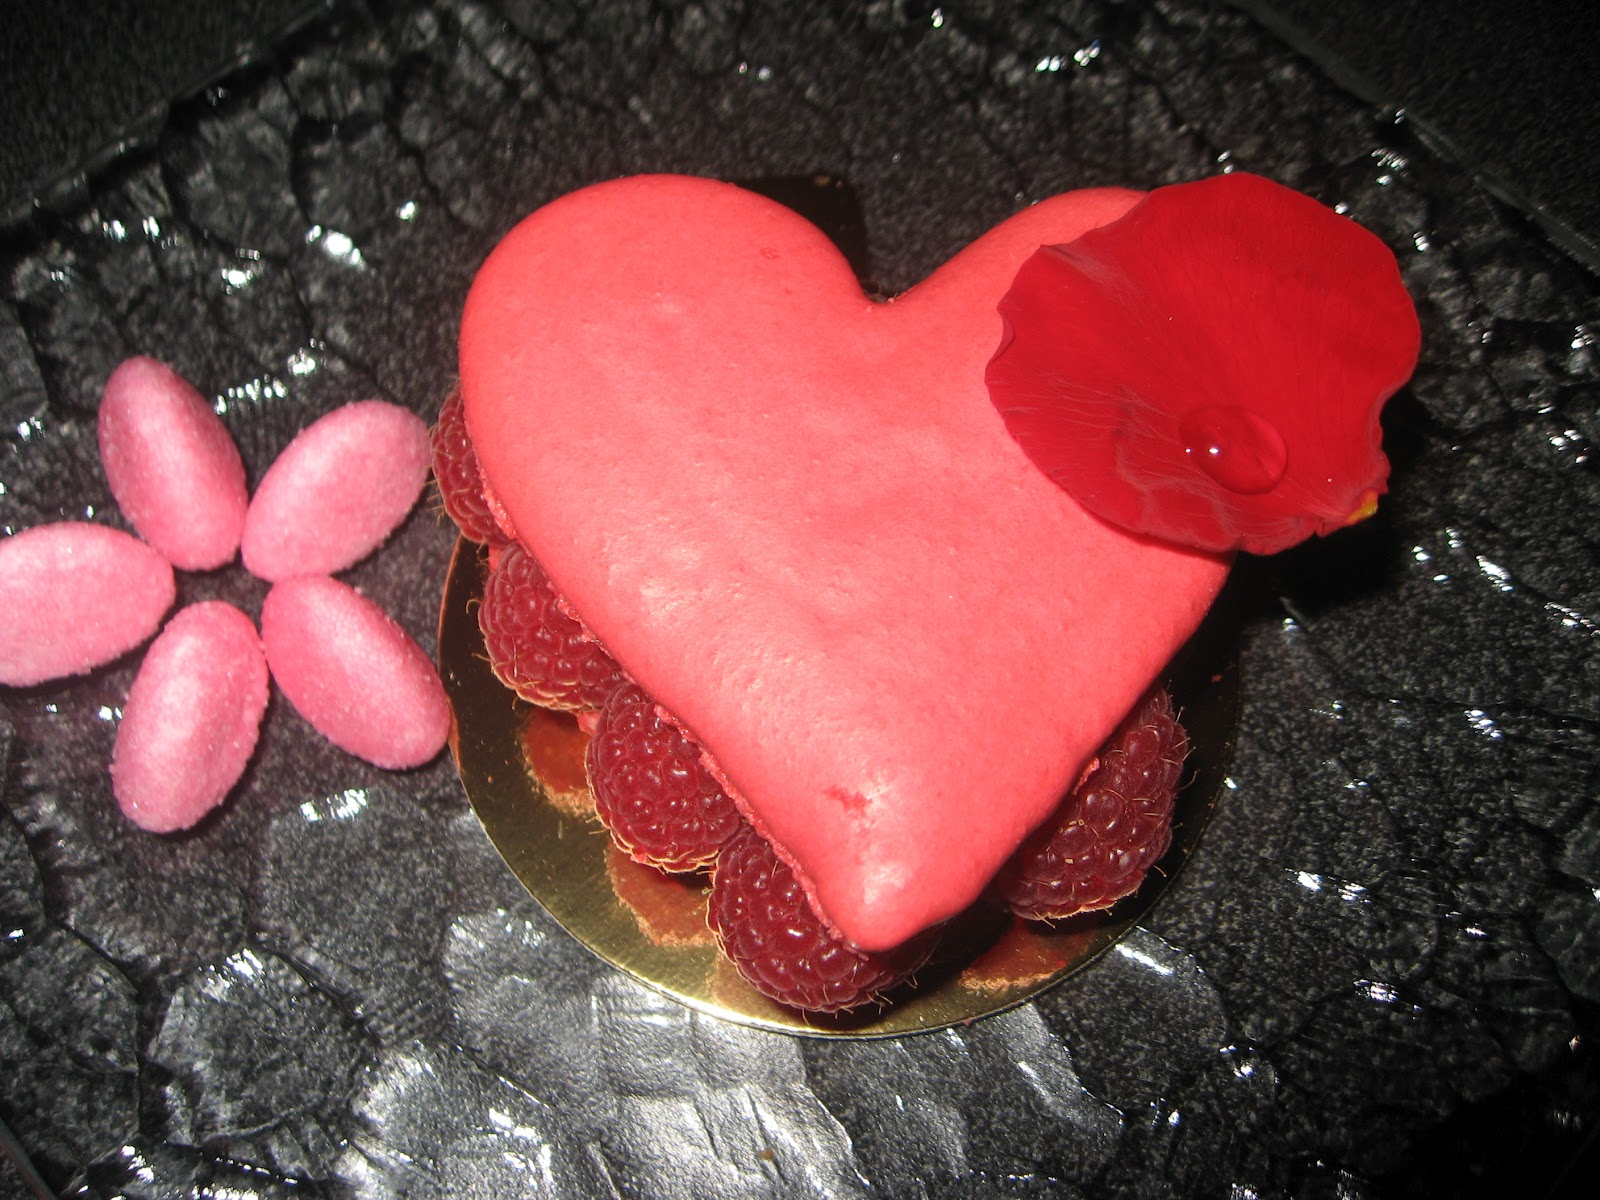 Macaron vanille rencontre [PUNIQRANDLINE-(au-dating-names.txt) 26